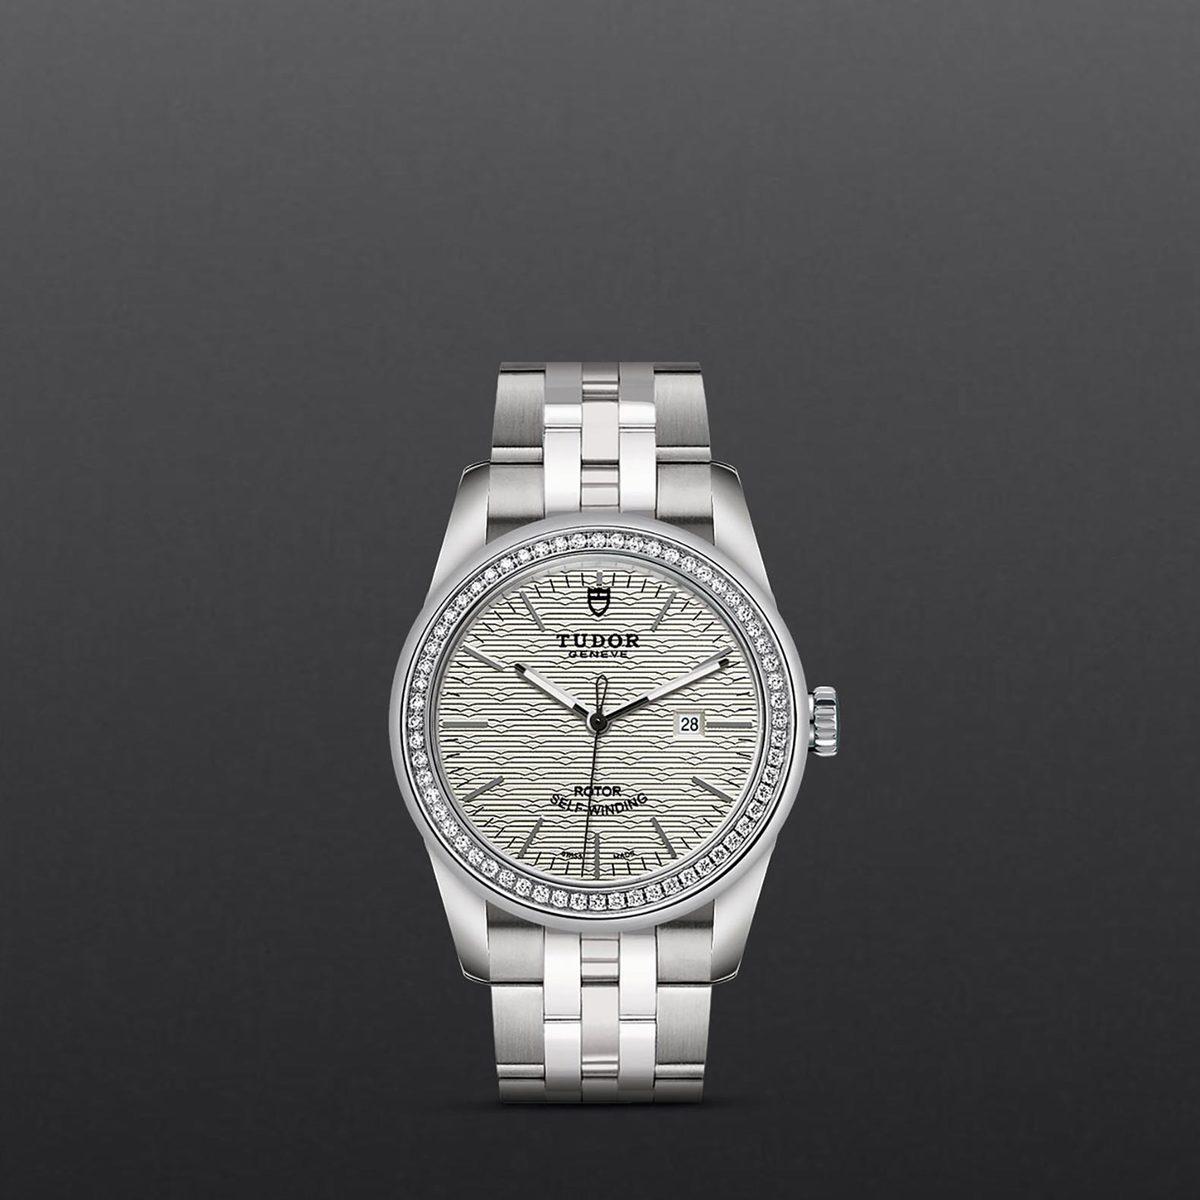 Tudor Glamour Date M53020-0001